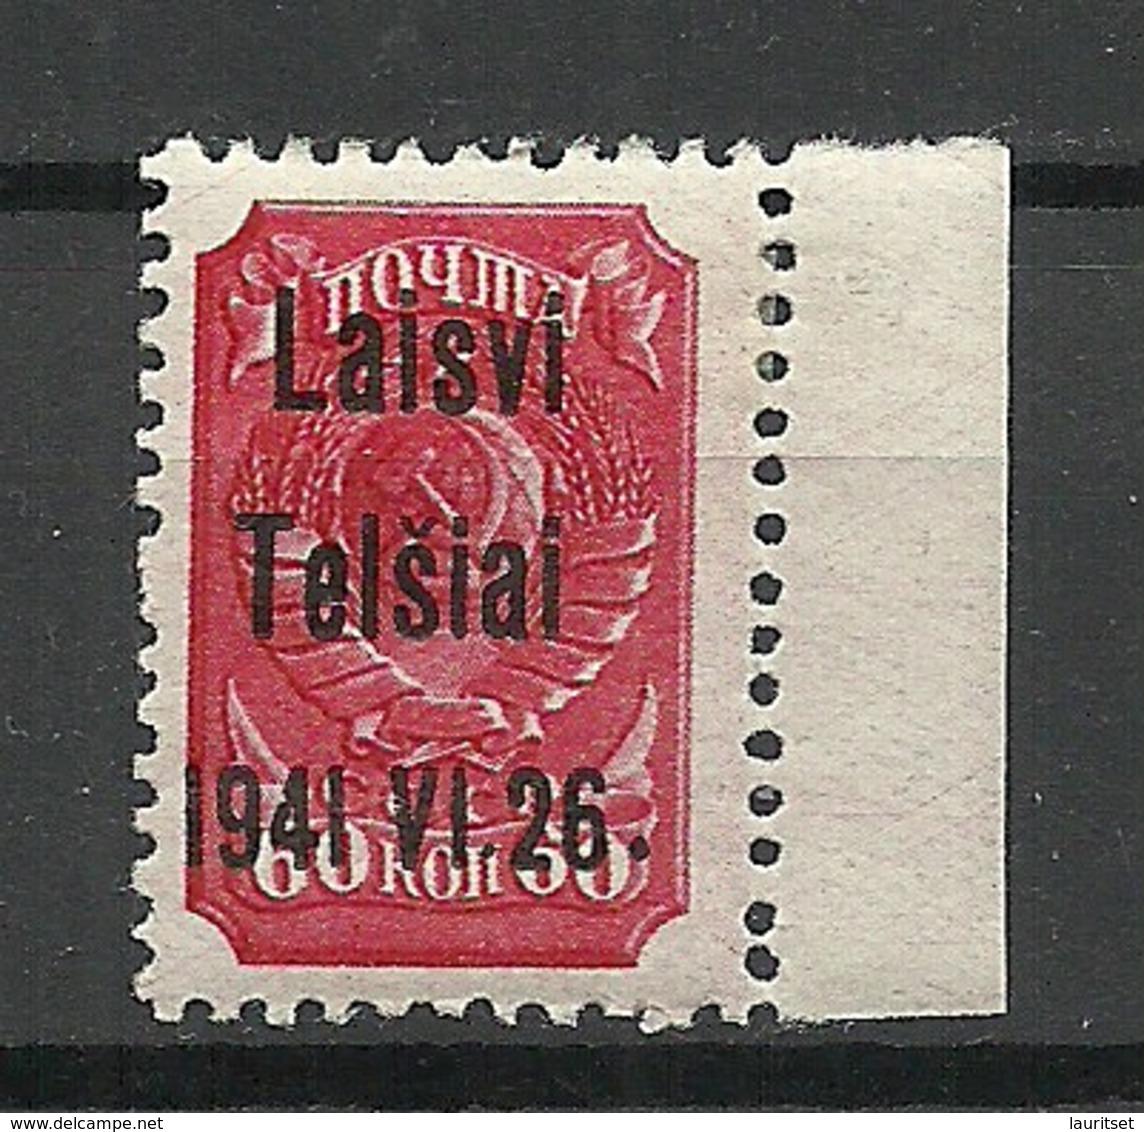 LITAUEN Lithuania 1941 German Occupation Telšiai Michel 7 * - Occupation 1938-45